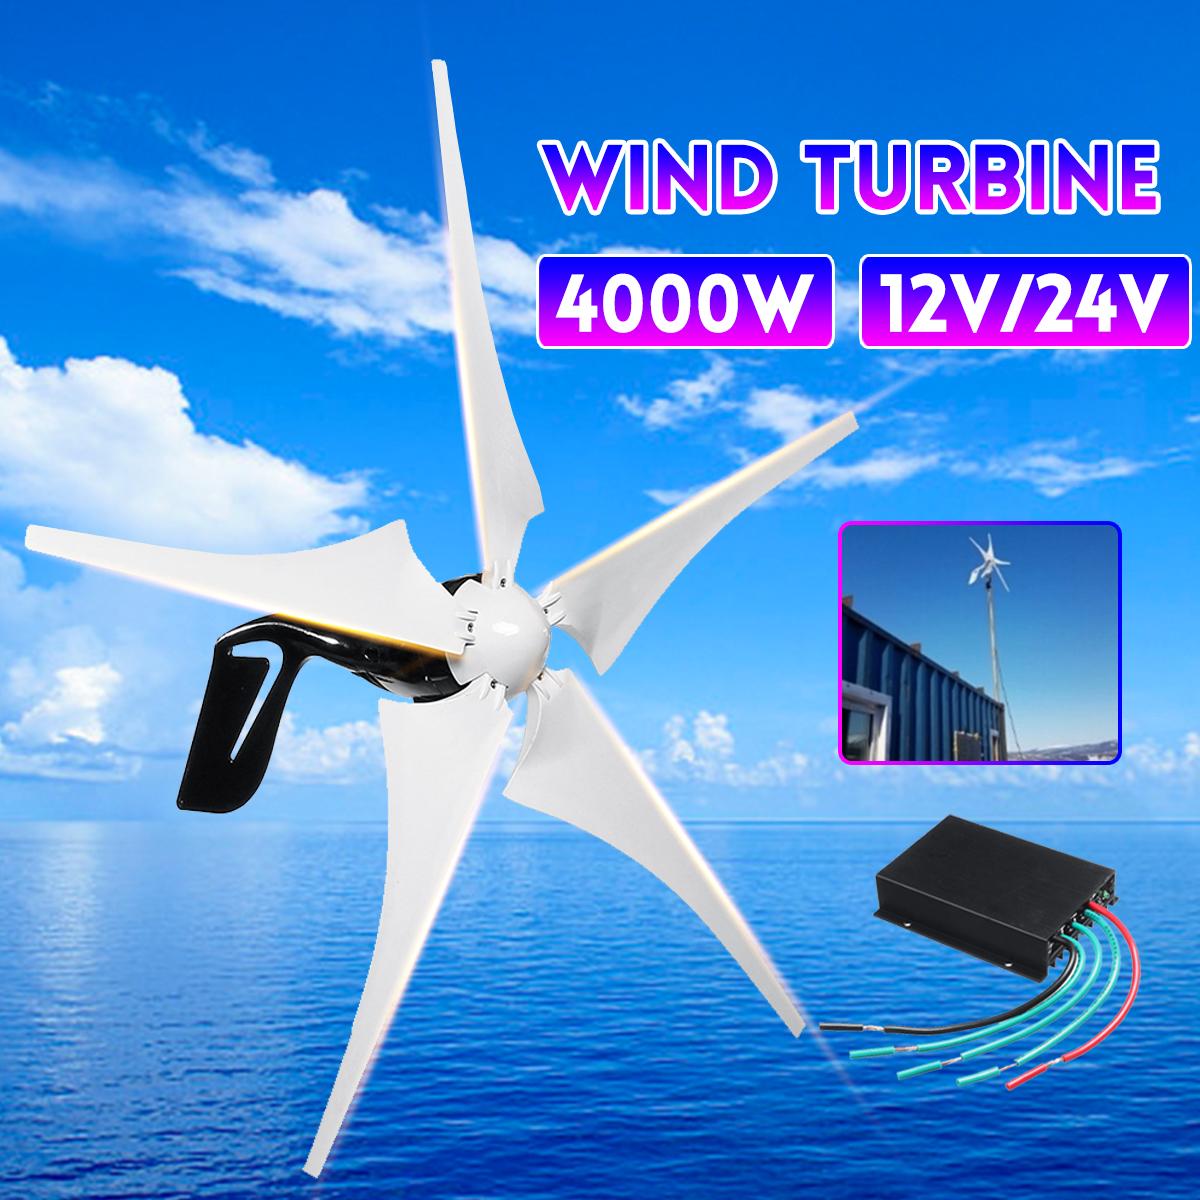 500W WIND TURBINE GENERATOR KIT DC12V AEROGENERATOR 3 BLADES FOR HOME /& INDUSTRY